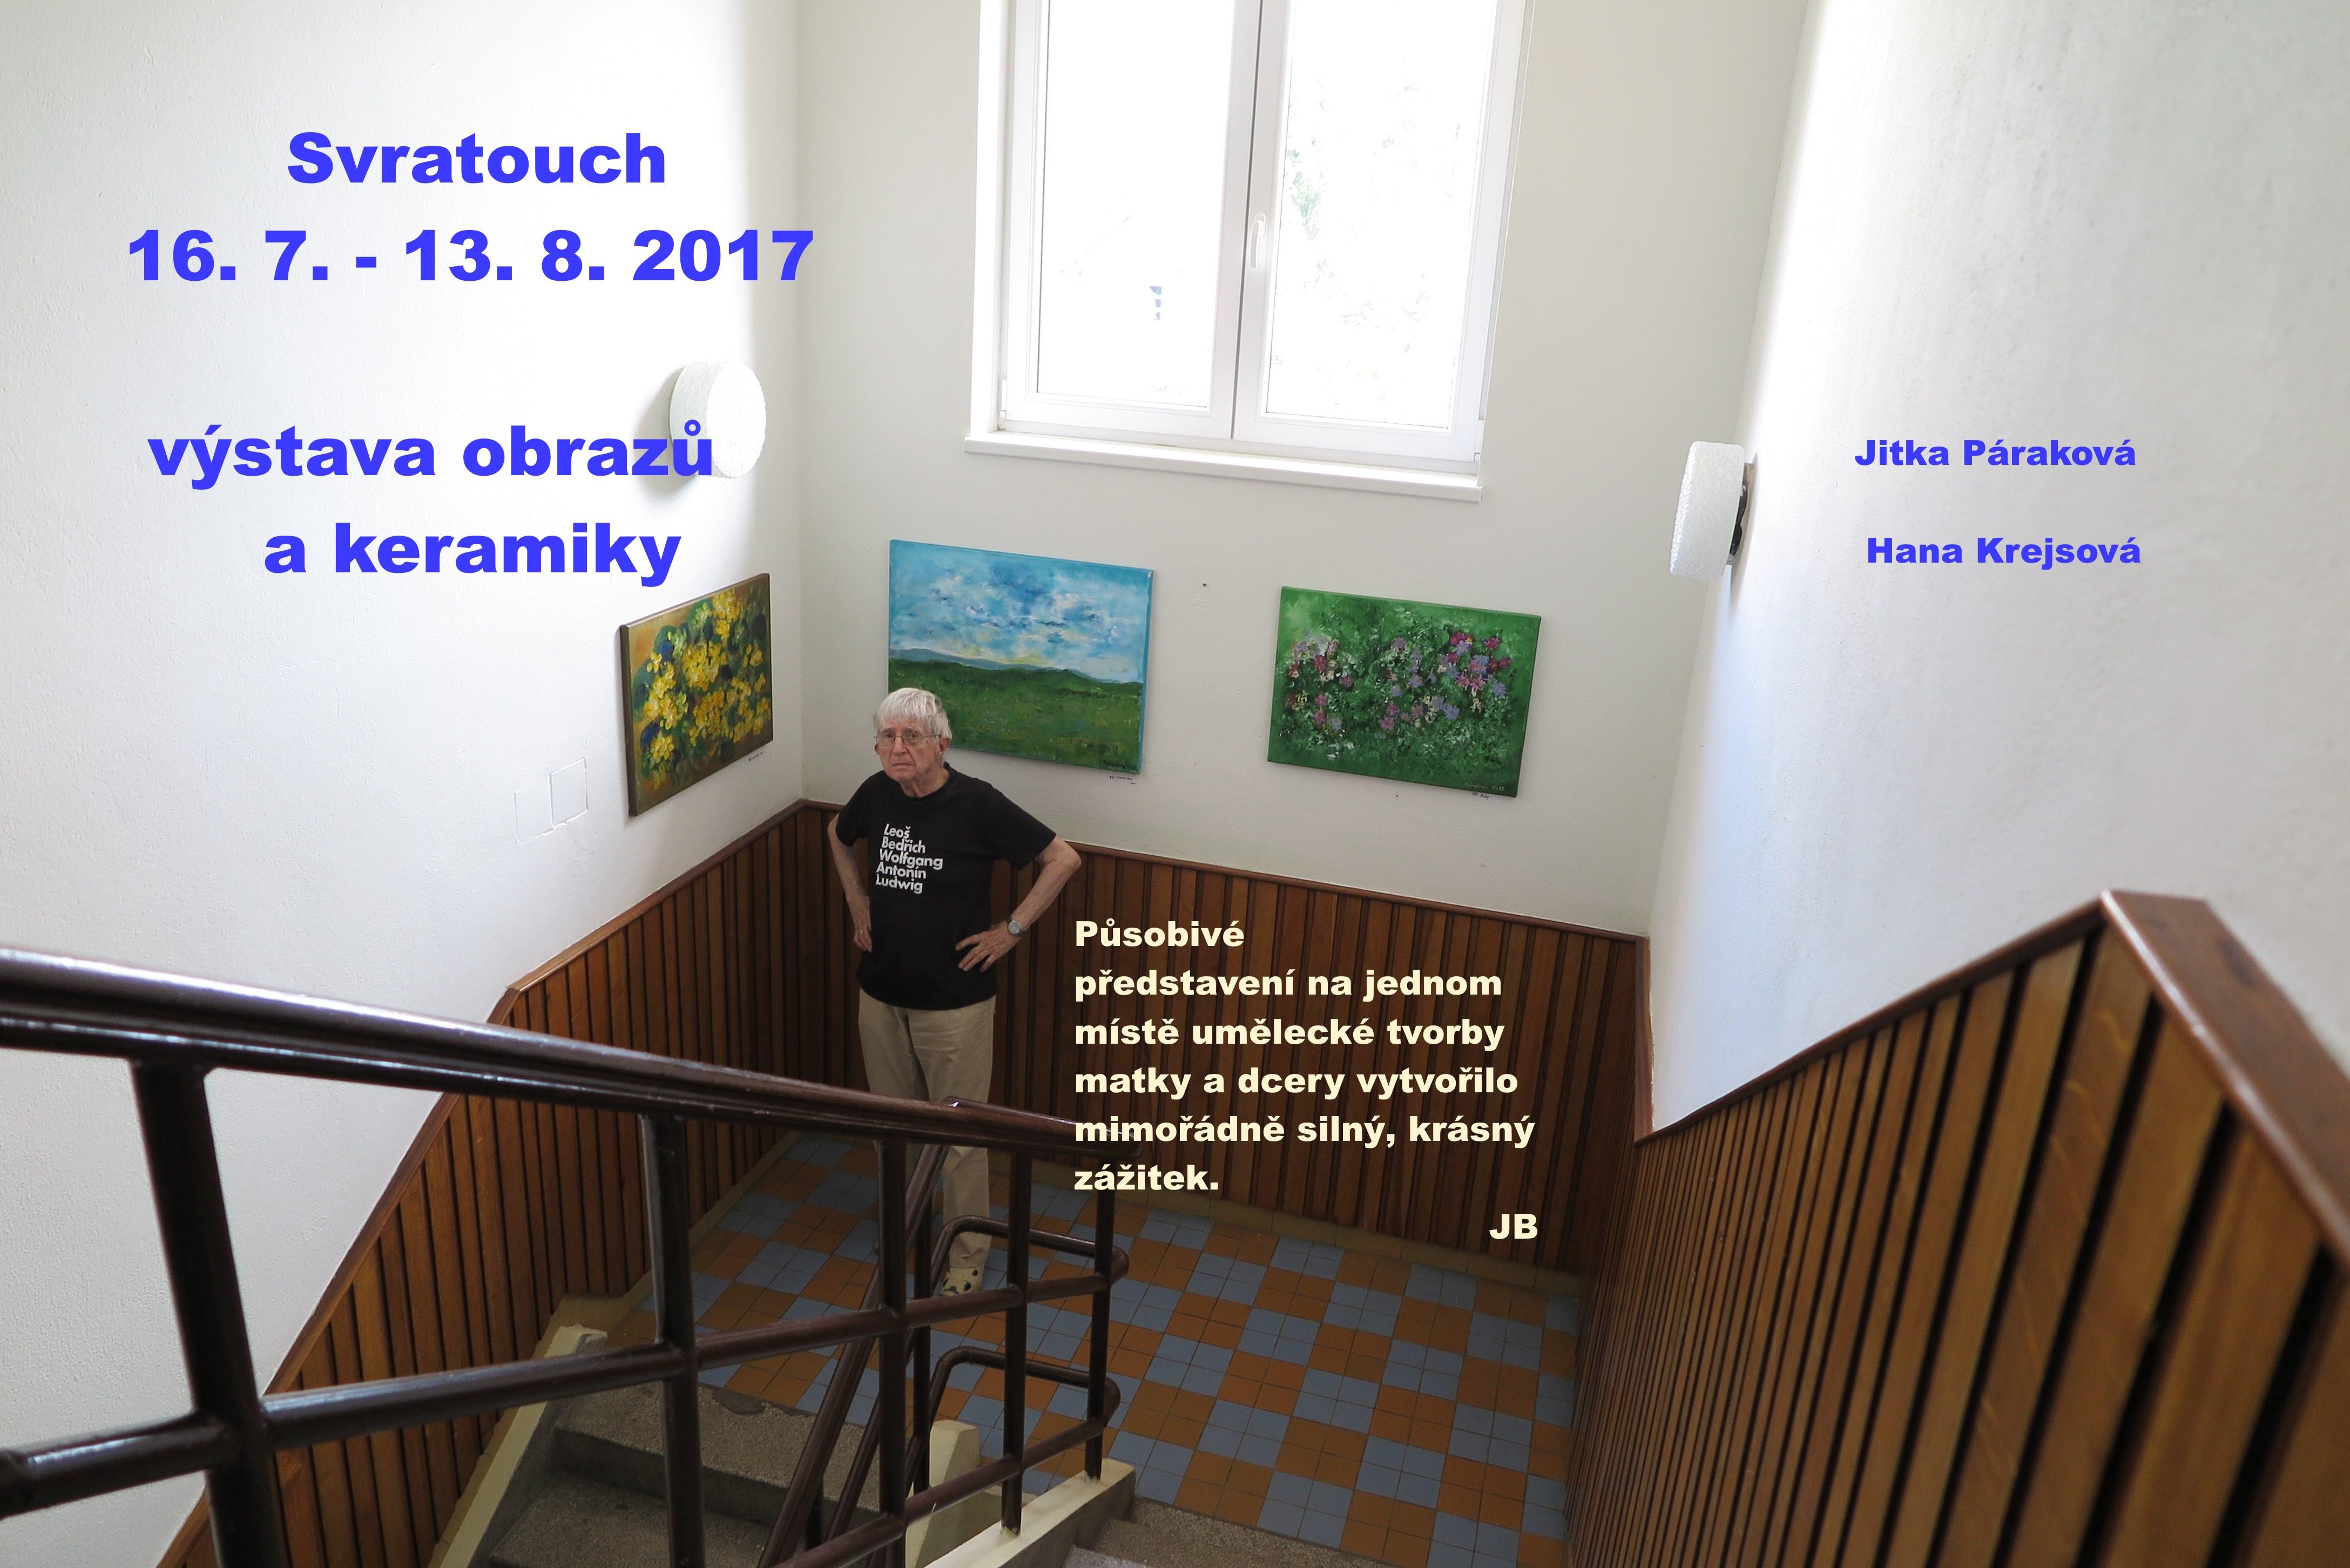 Svratouch 2017